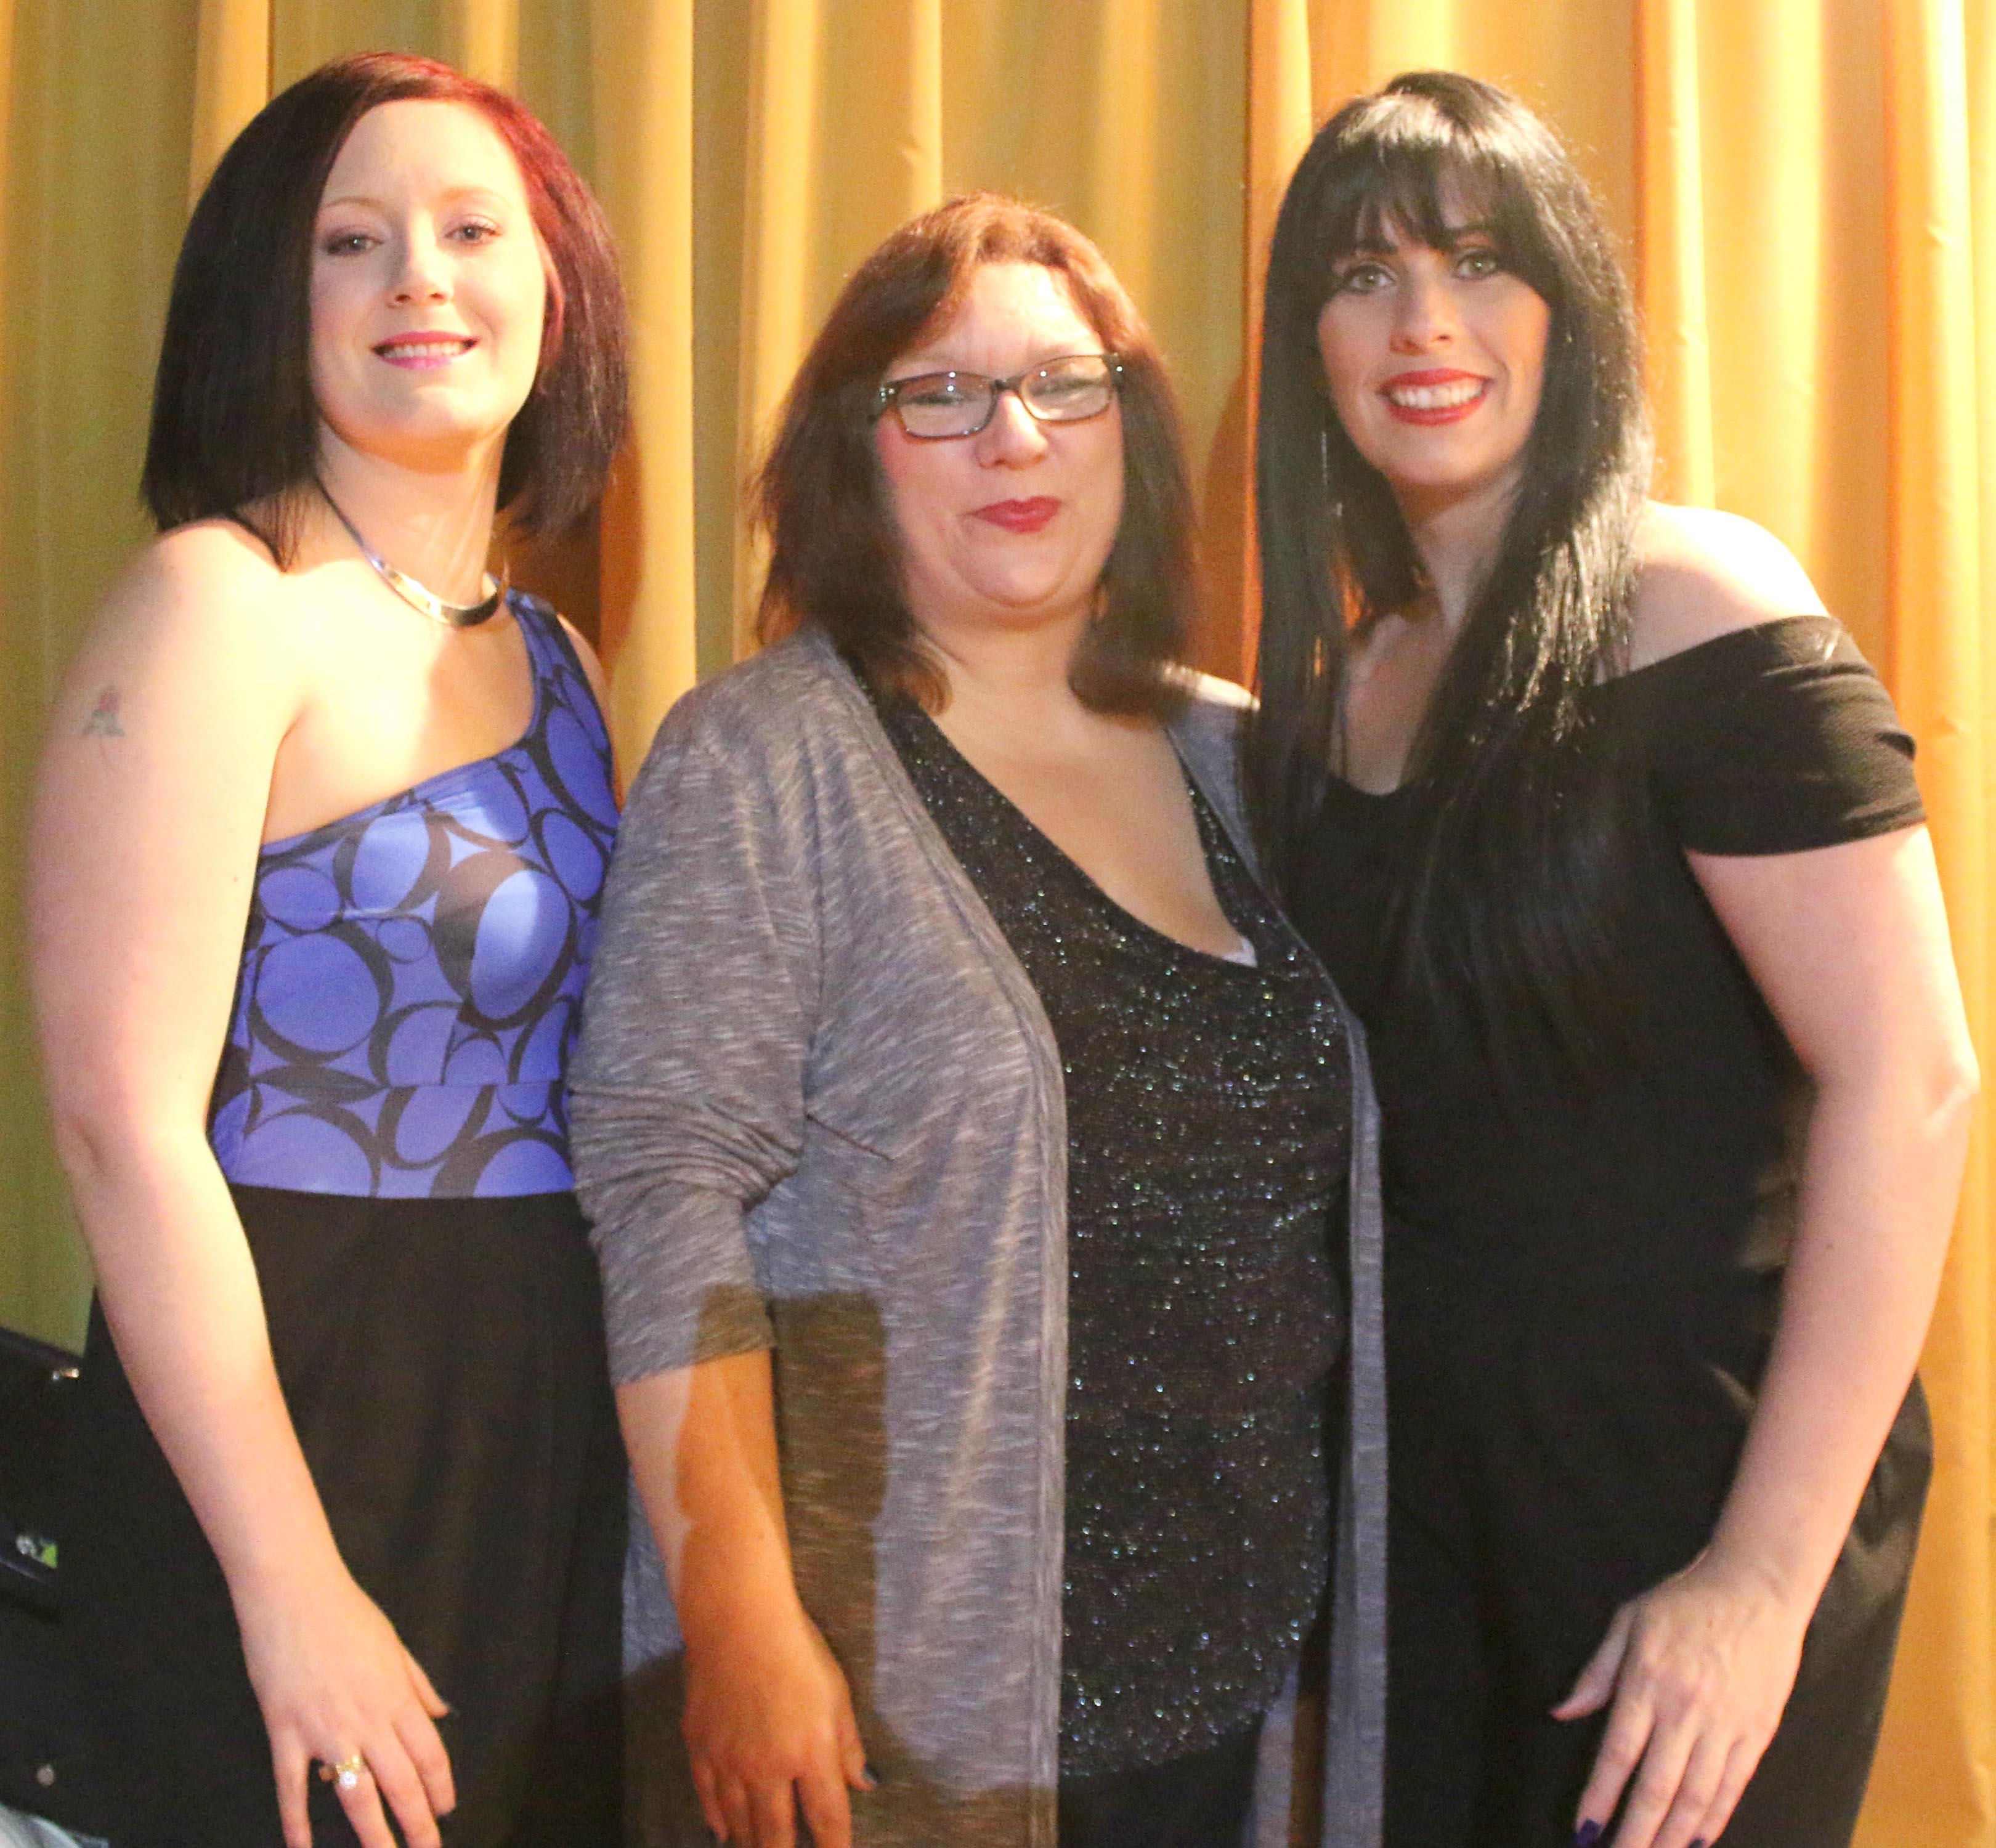 Rotary Club Charity Night at the Phoenix